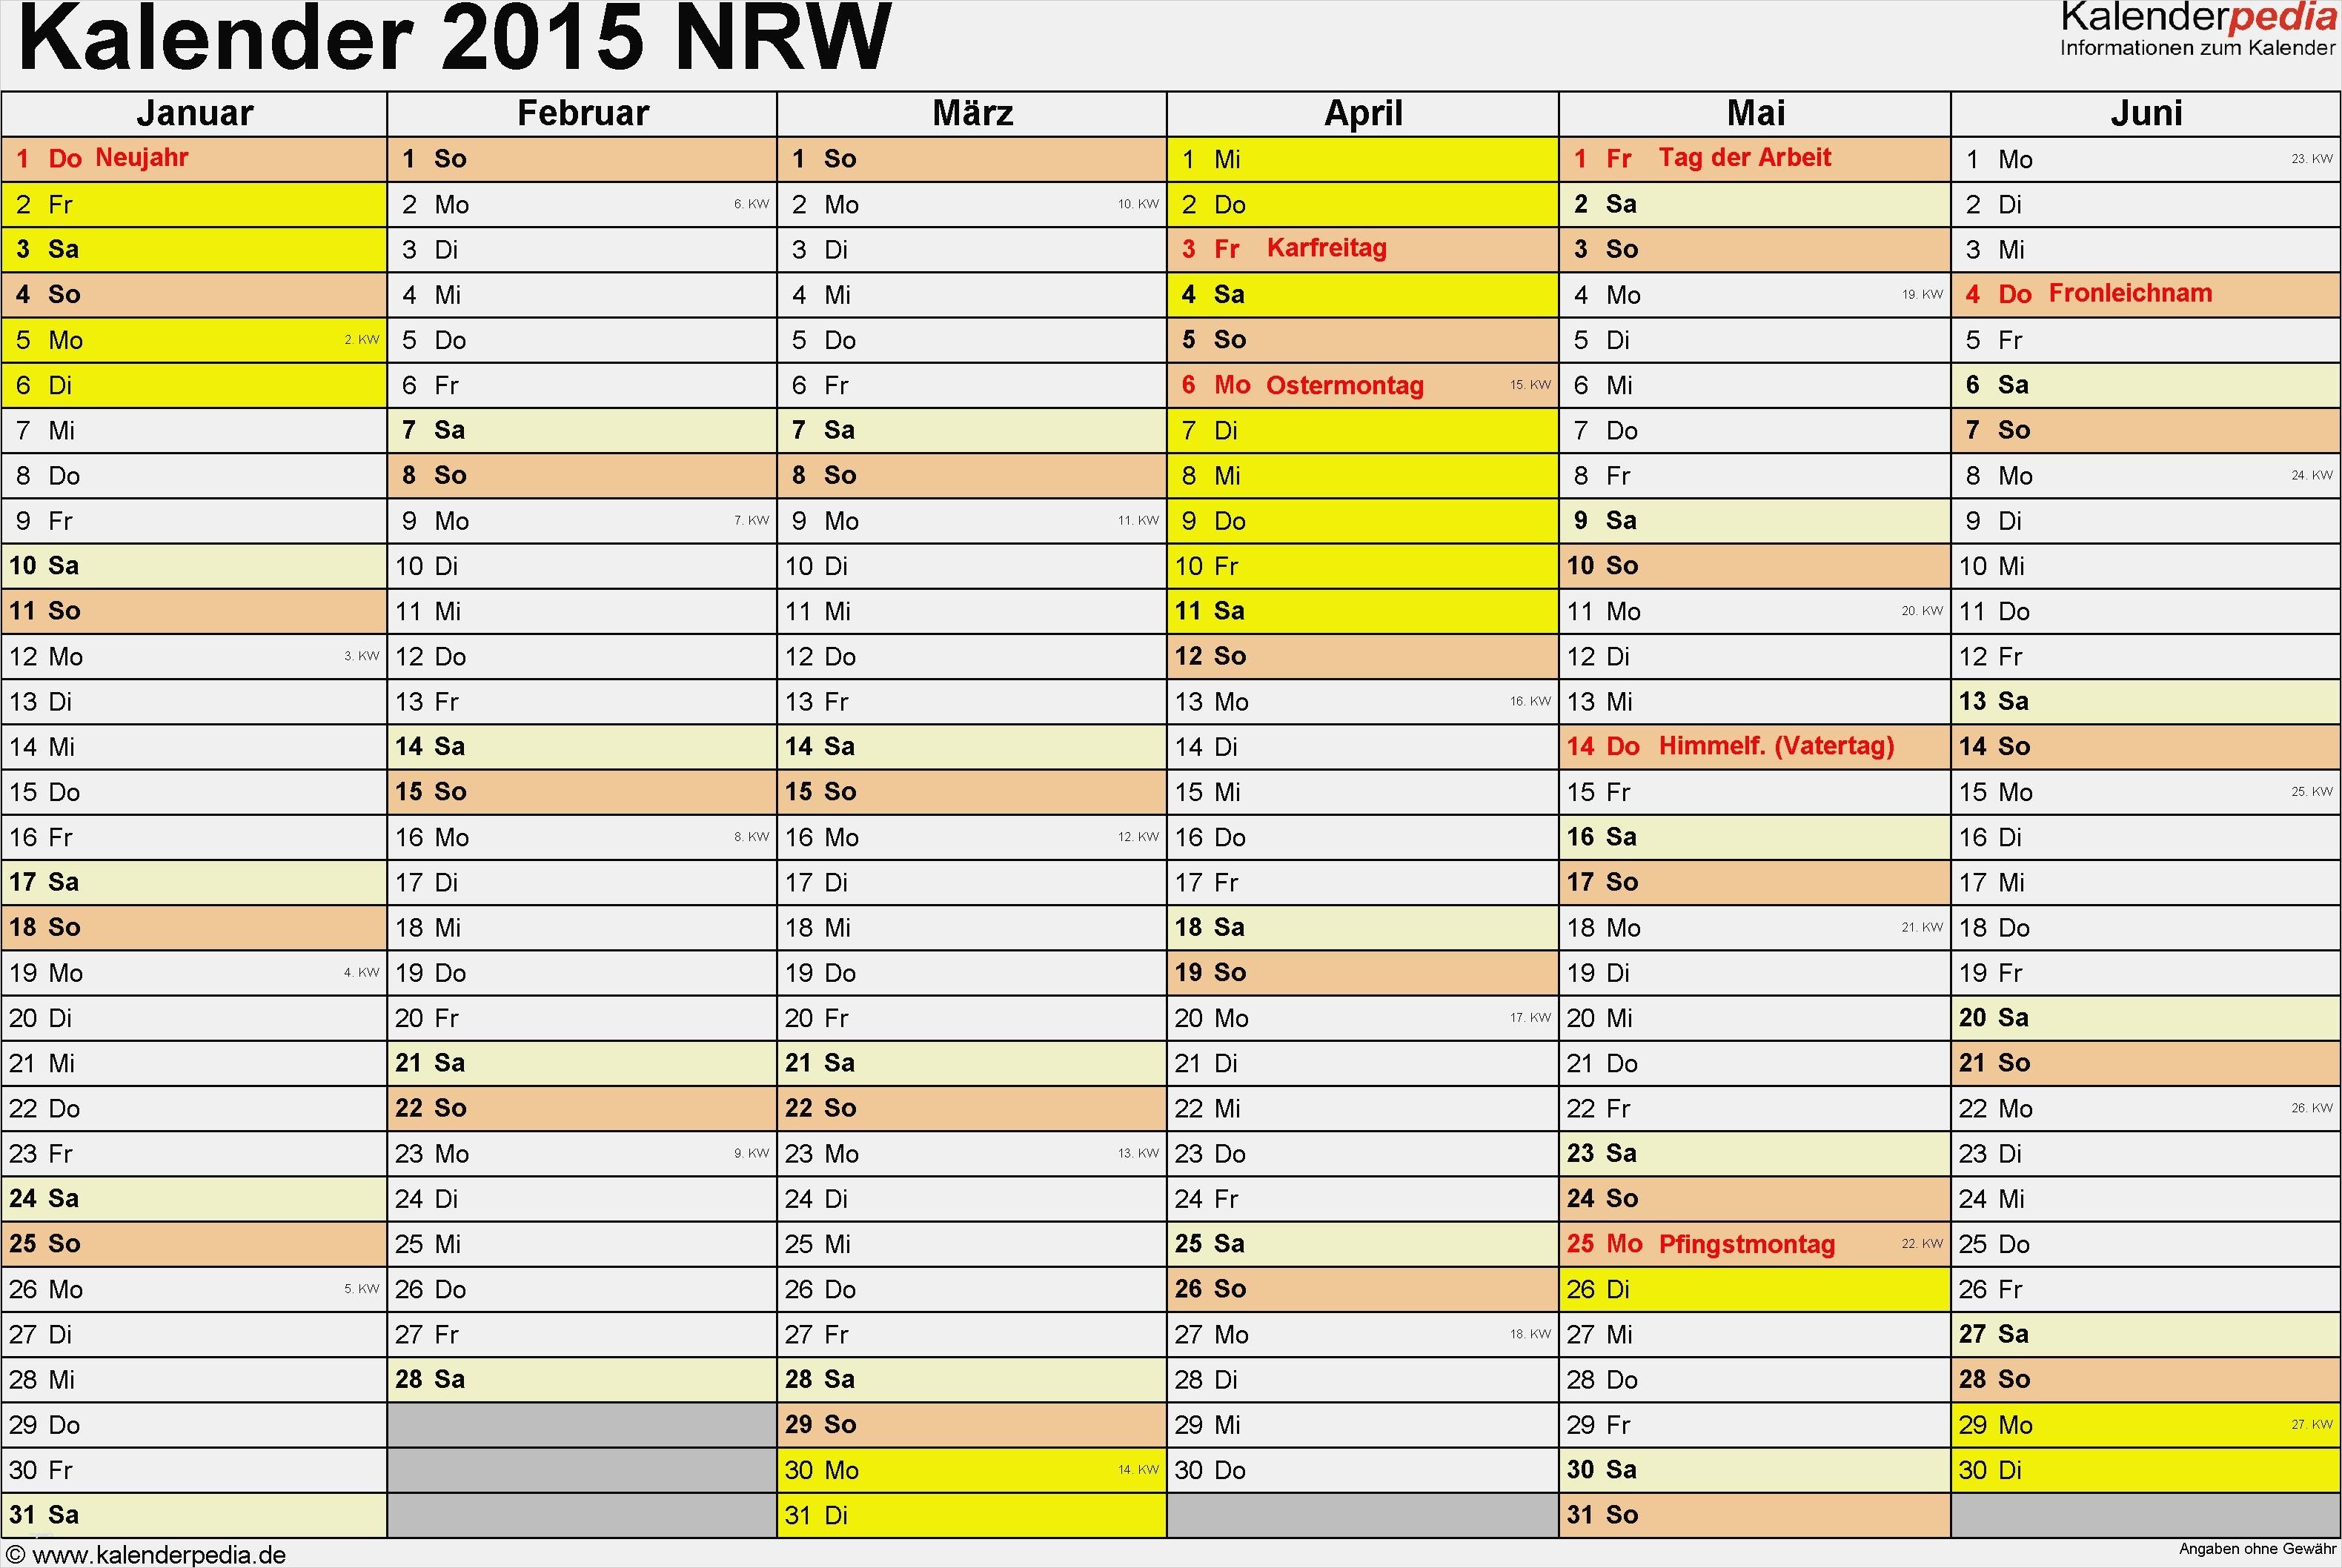 kalender 2015 excel Solan ayodhya